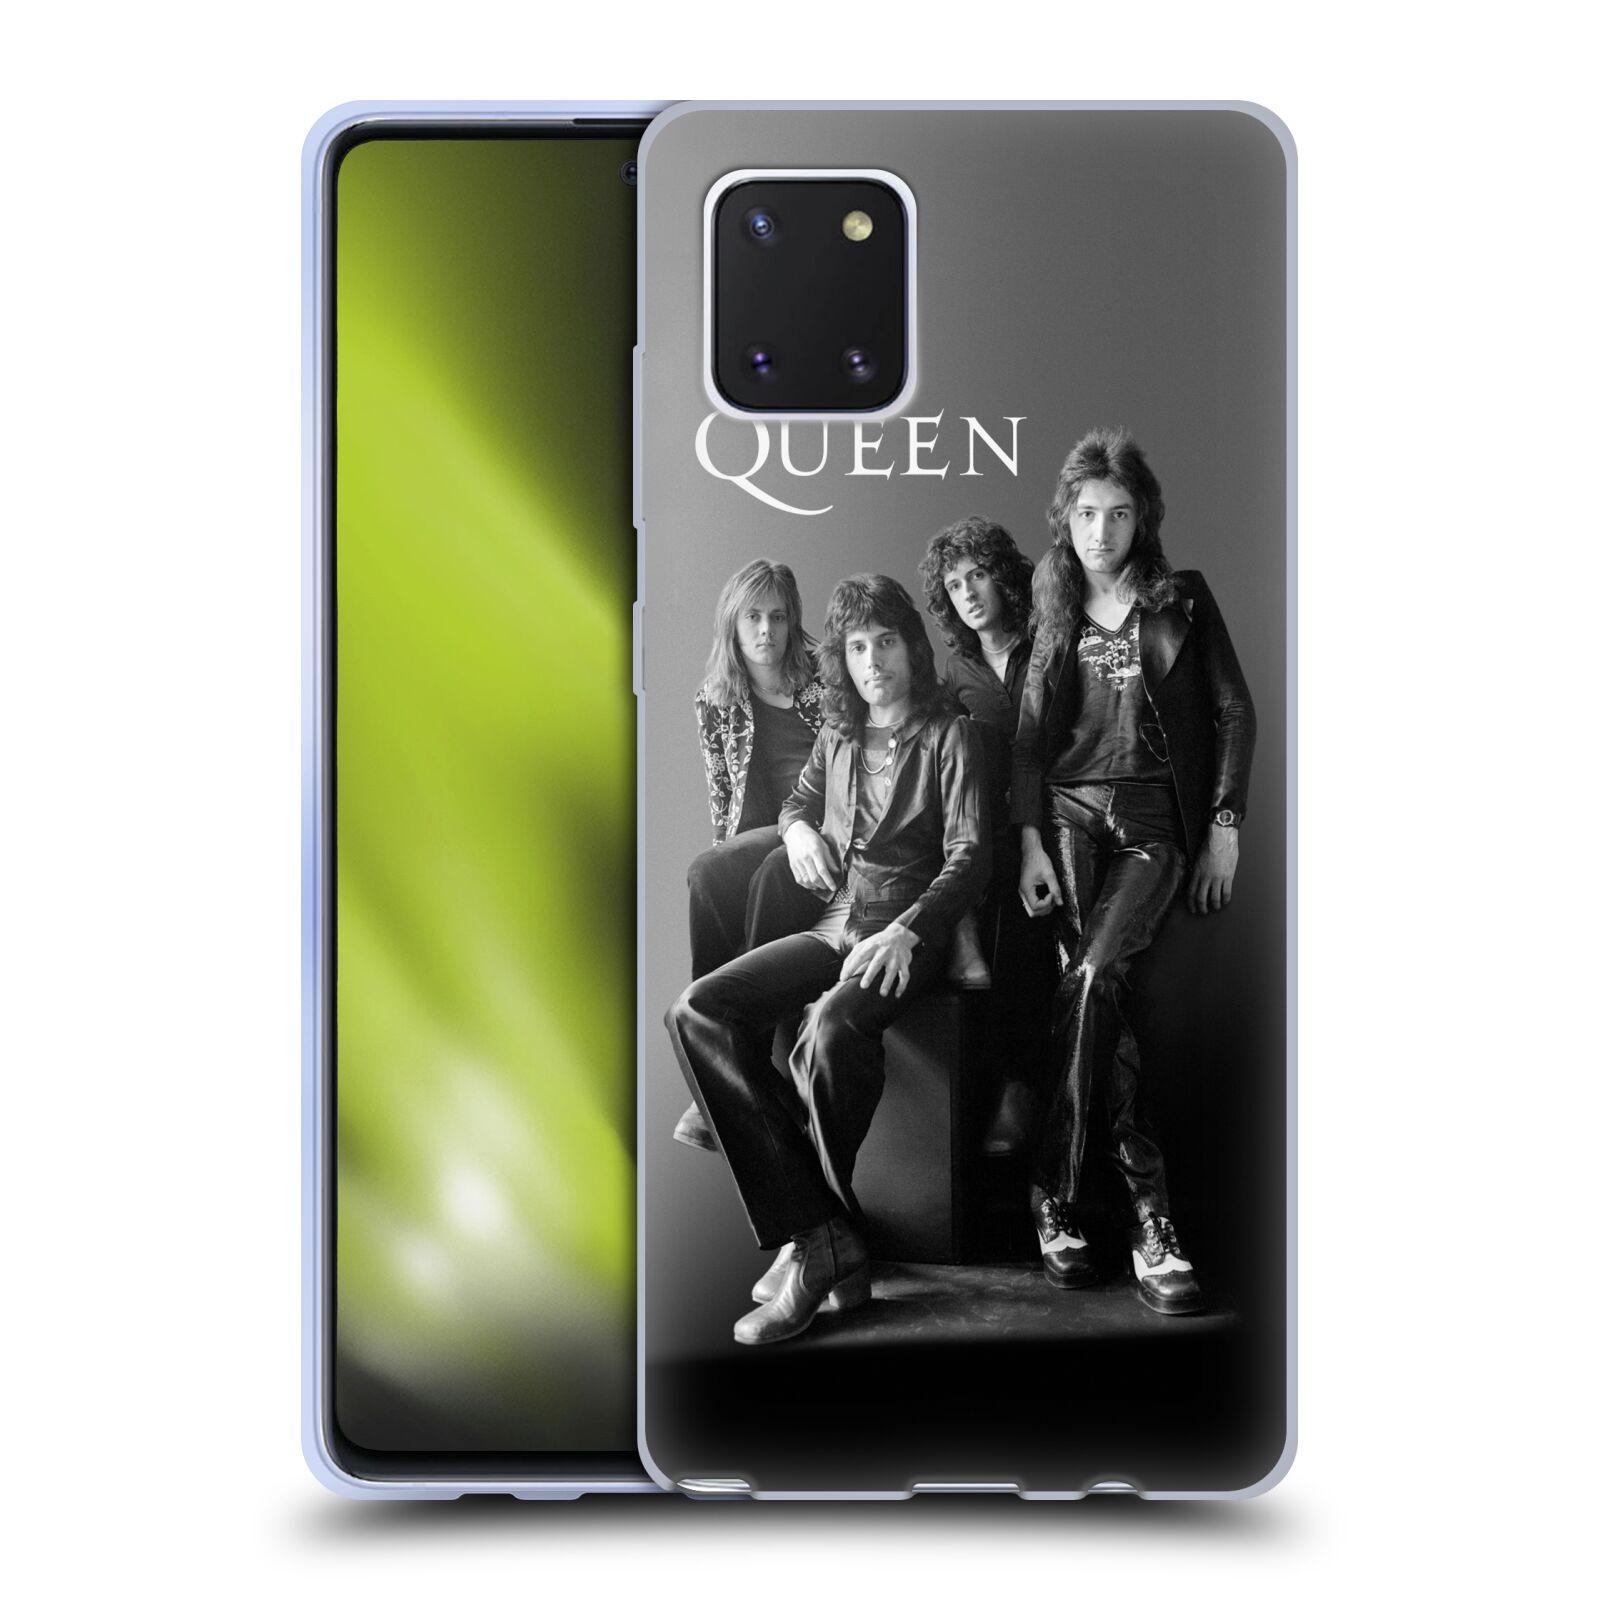 Silikonové pouzdro na mobil Samsung Galaxy Note 10 Lite - Head Case - Queen - Skupina